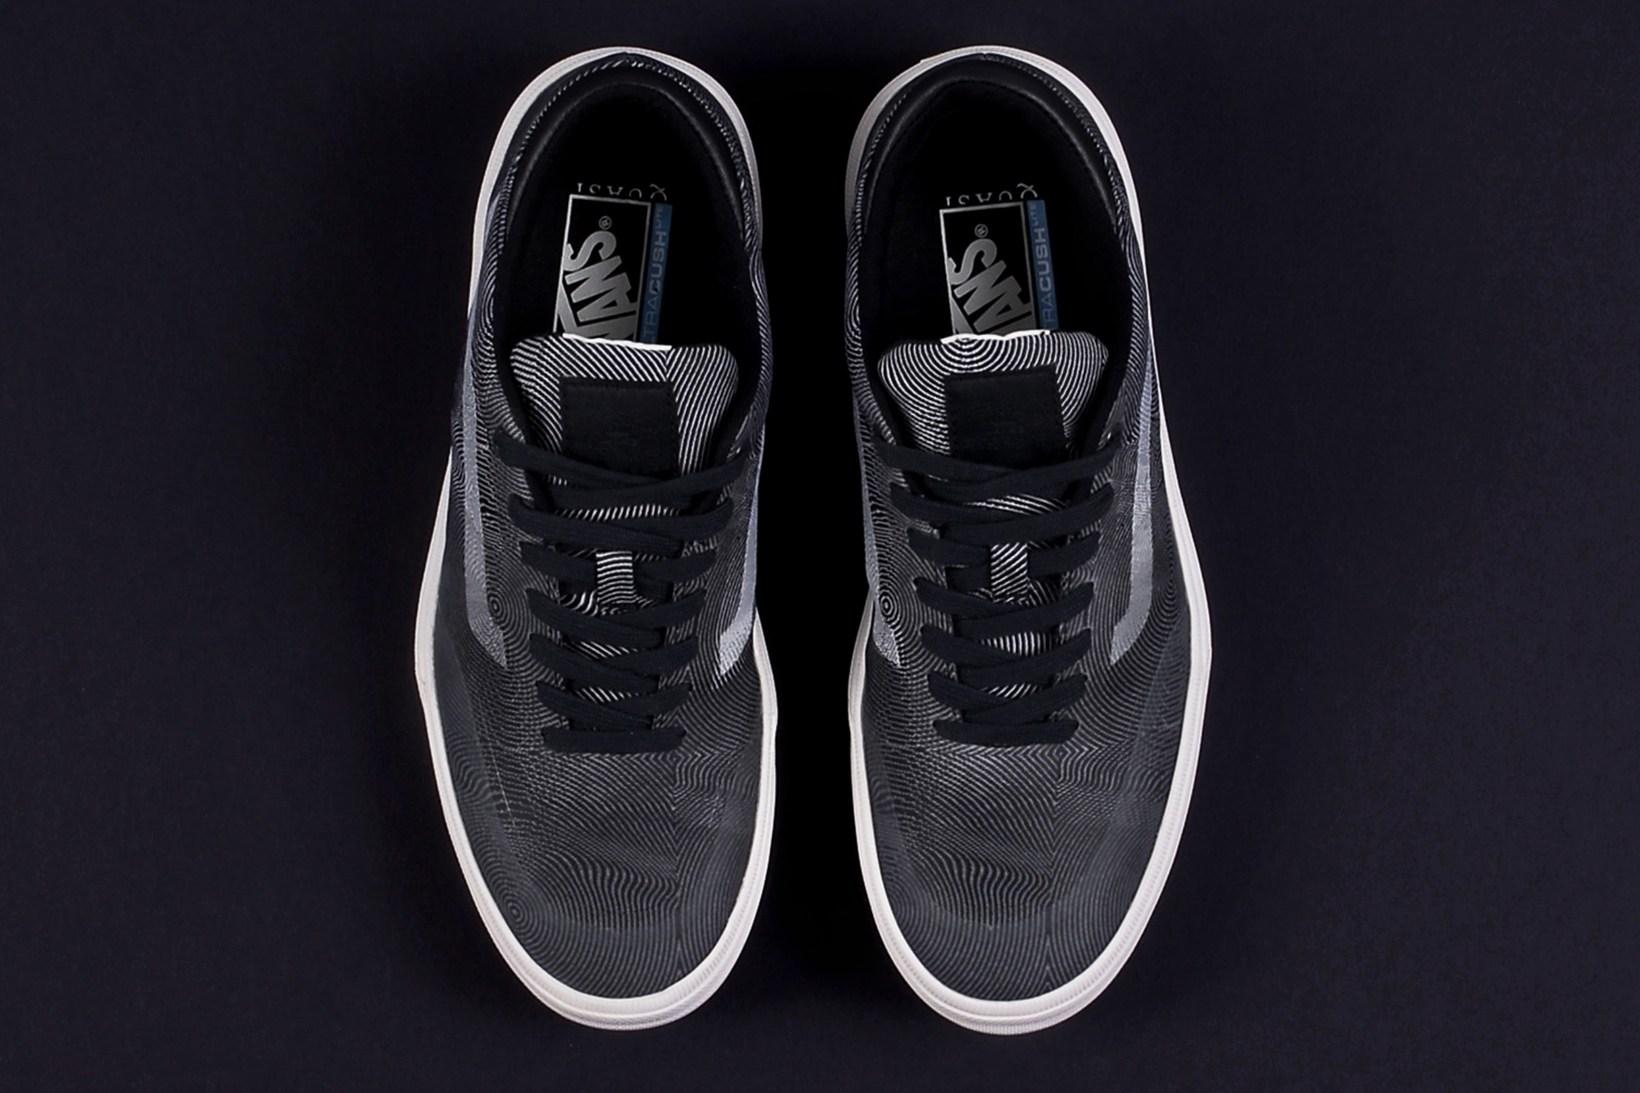 vans-pro-skate-arcad-gilbert-crockett-quasi-skateboards-5